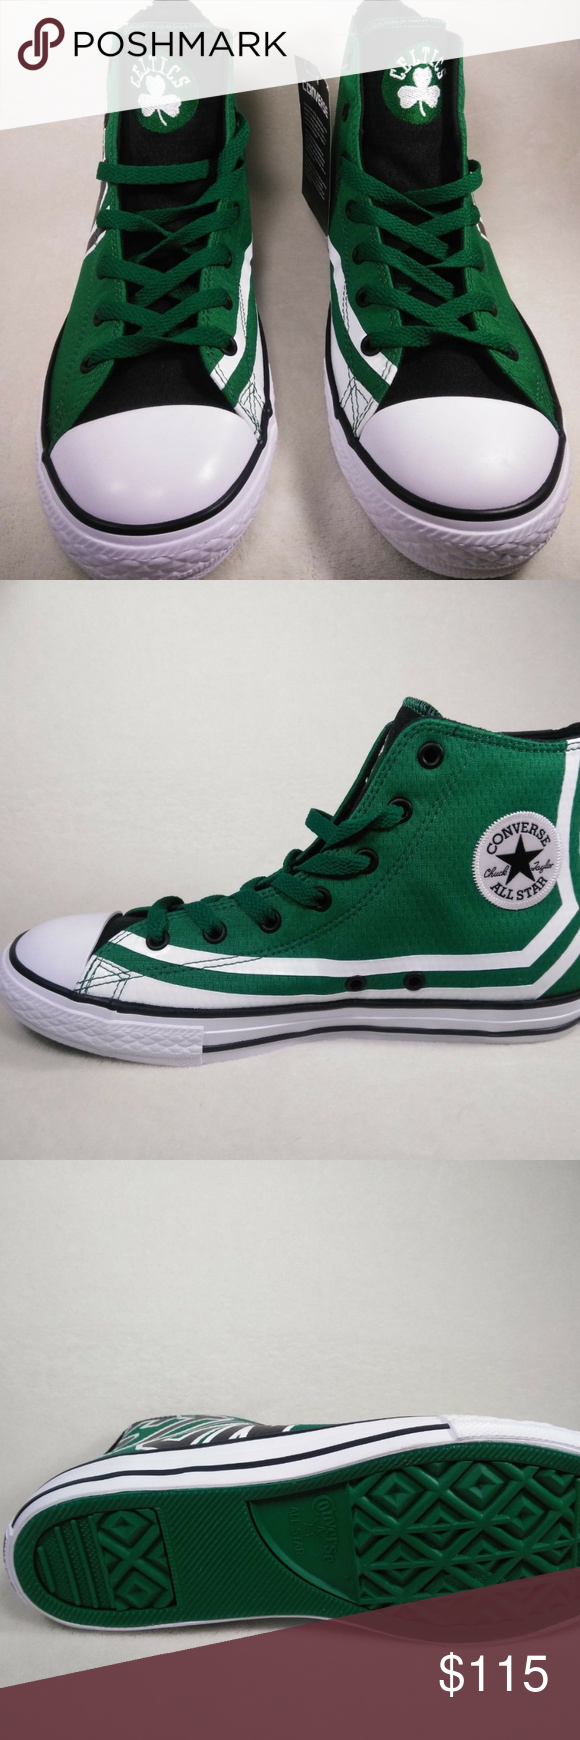 e41ee32ed04 Limited Edition Boston Celtics NBA Converse All St Limited Edition Boston  Celtics NBA Converse All Star Chuck Taylor Green White Sz 4.No box.